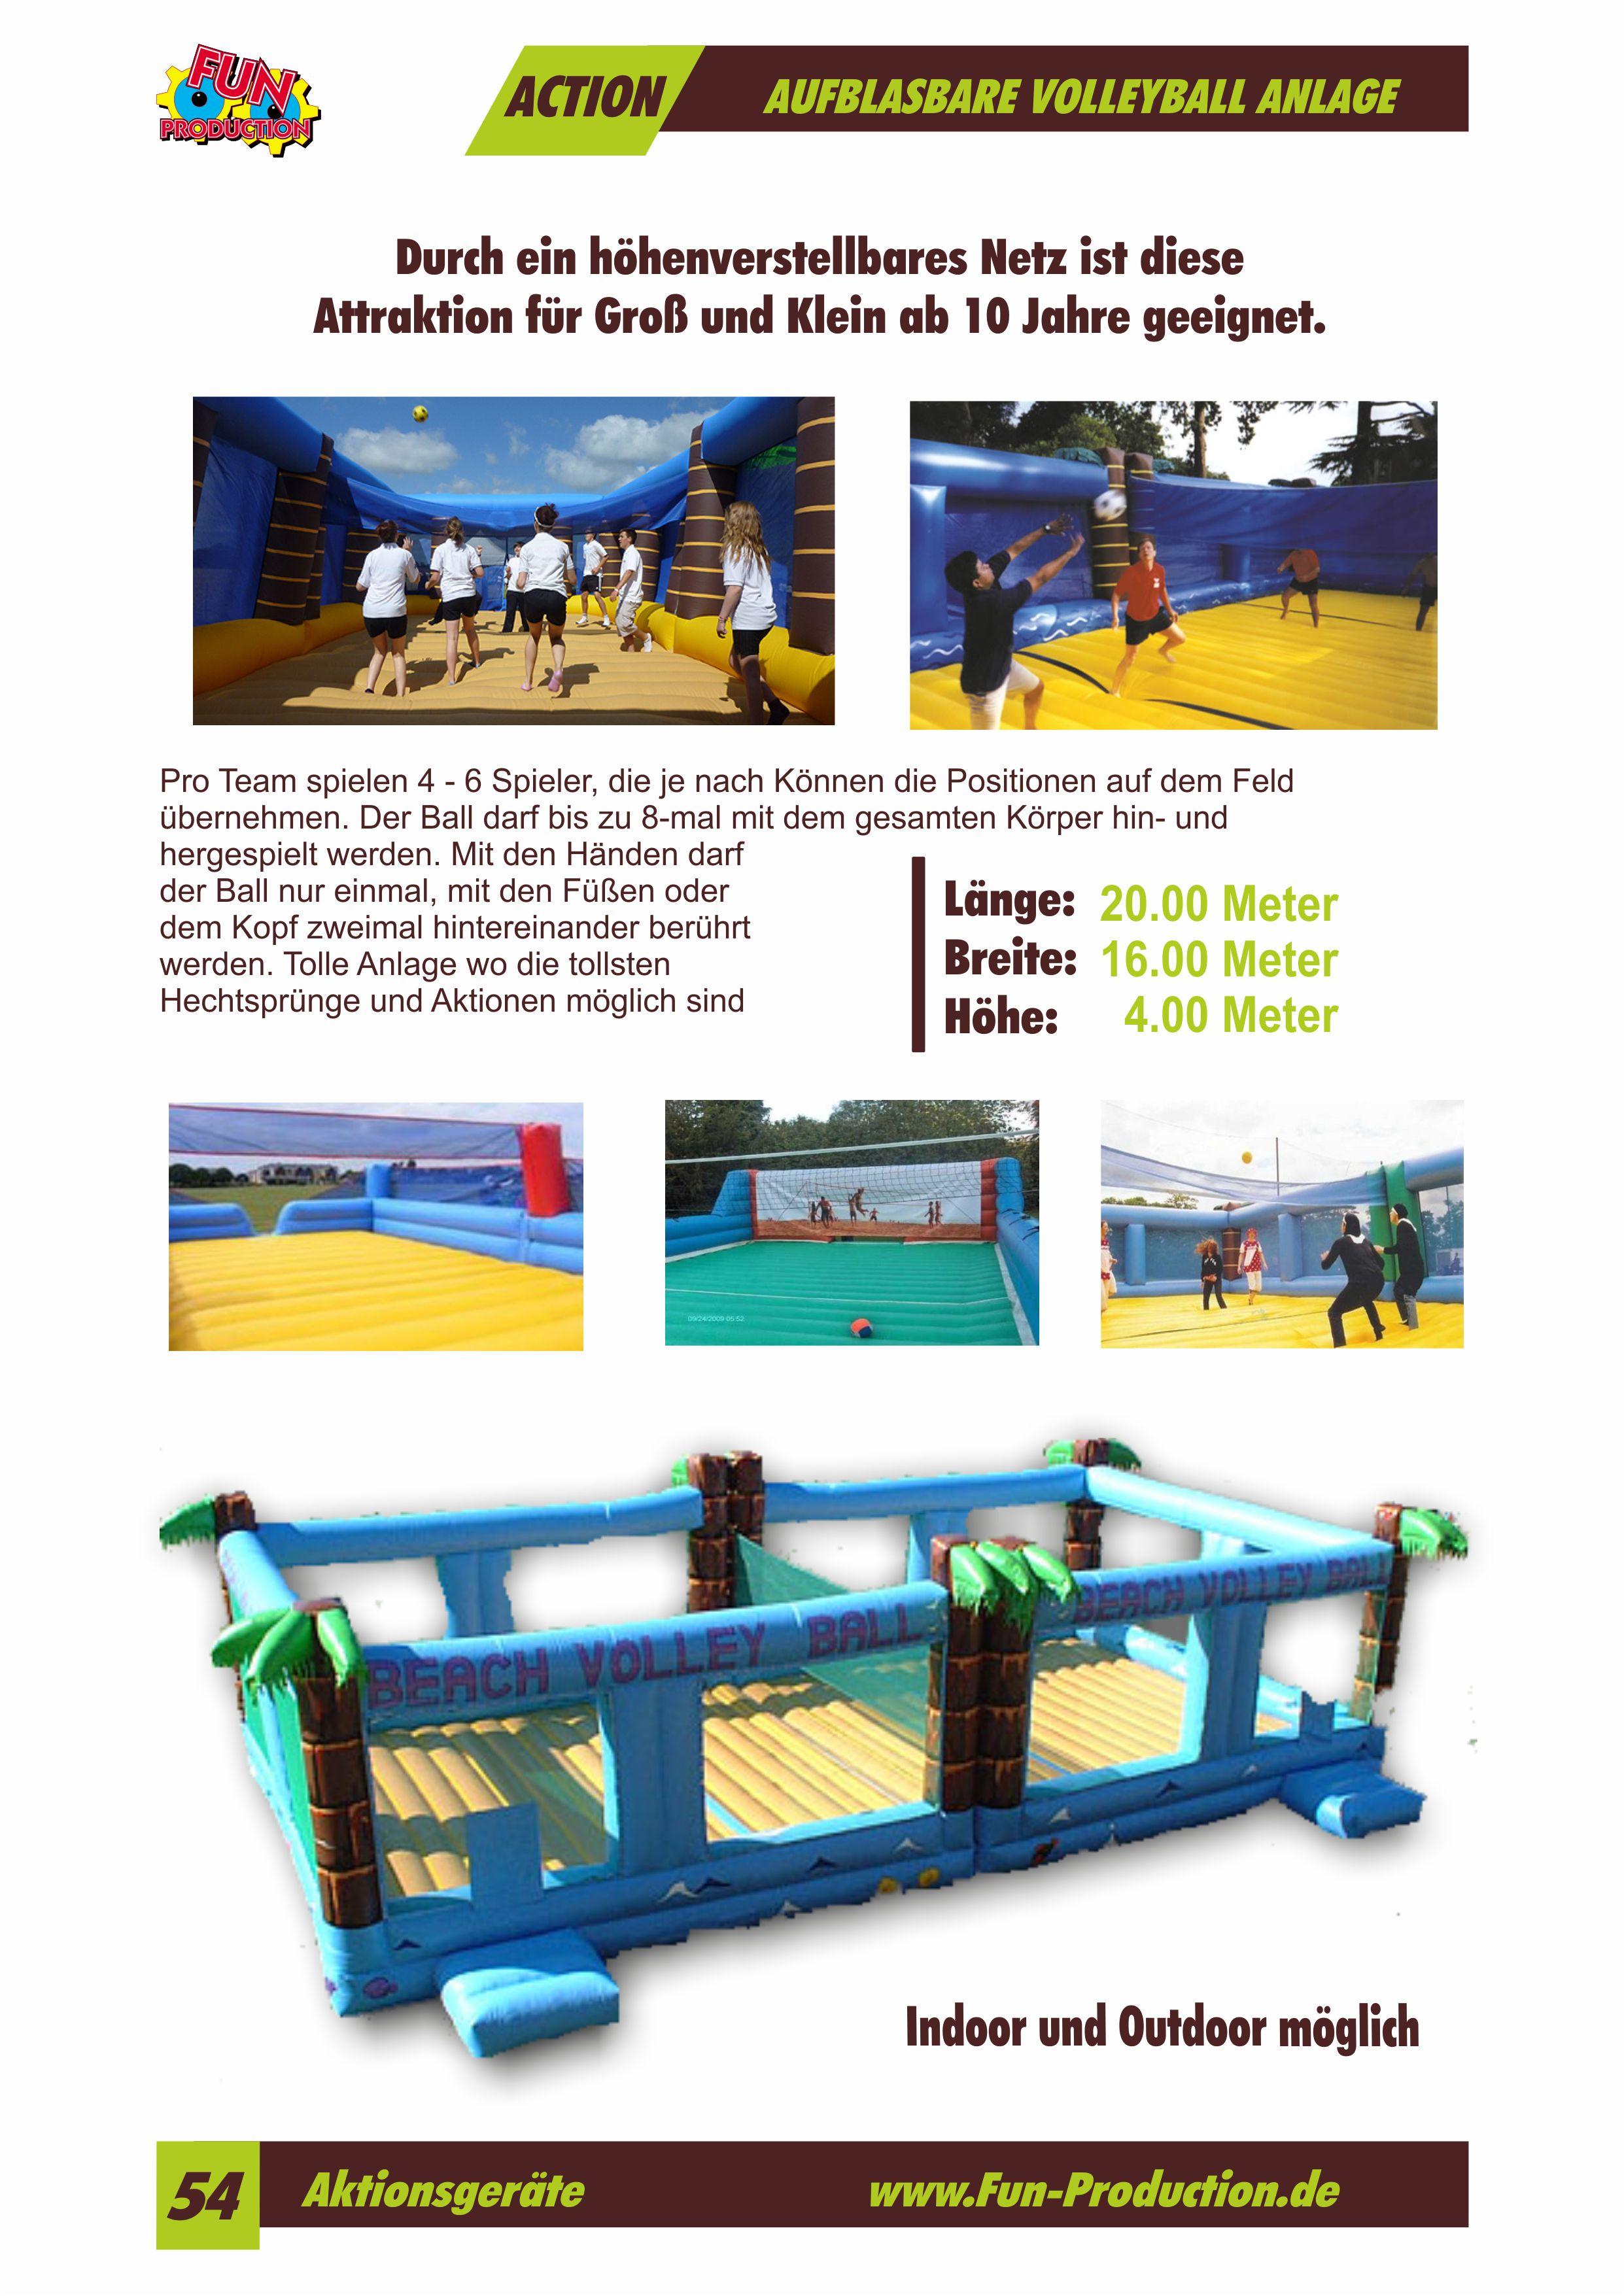 Aufblasbare Volleyball Anlage Fun Production GmbH